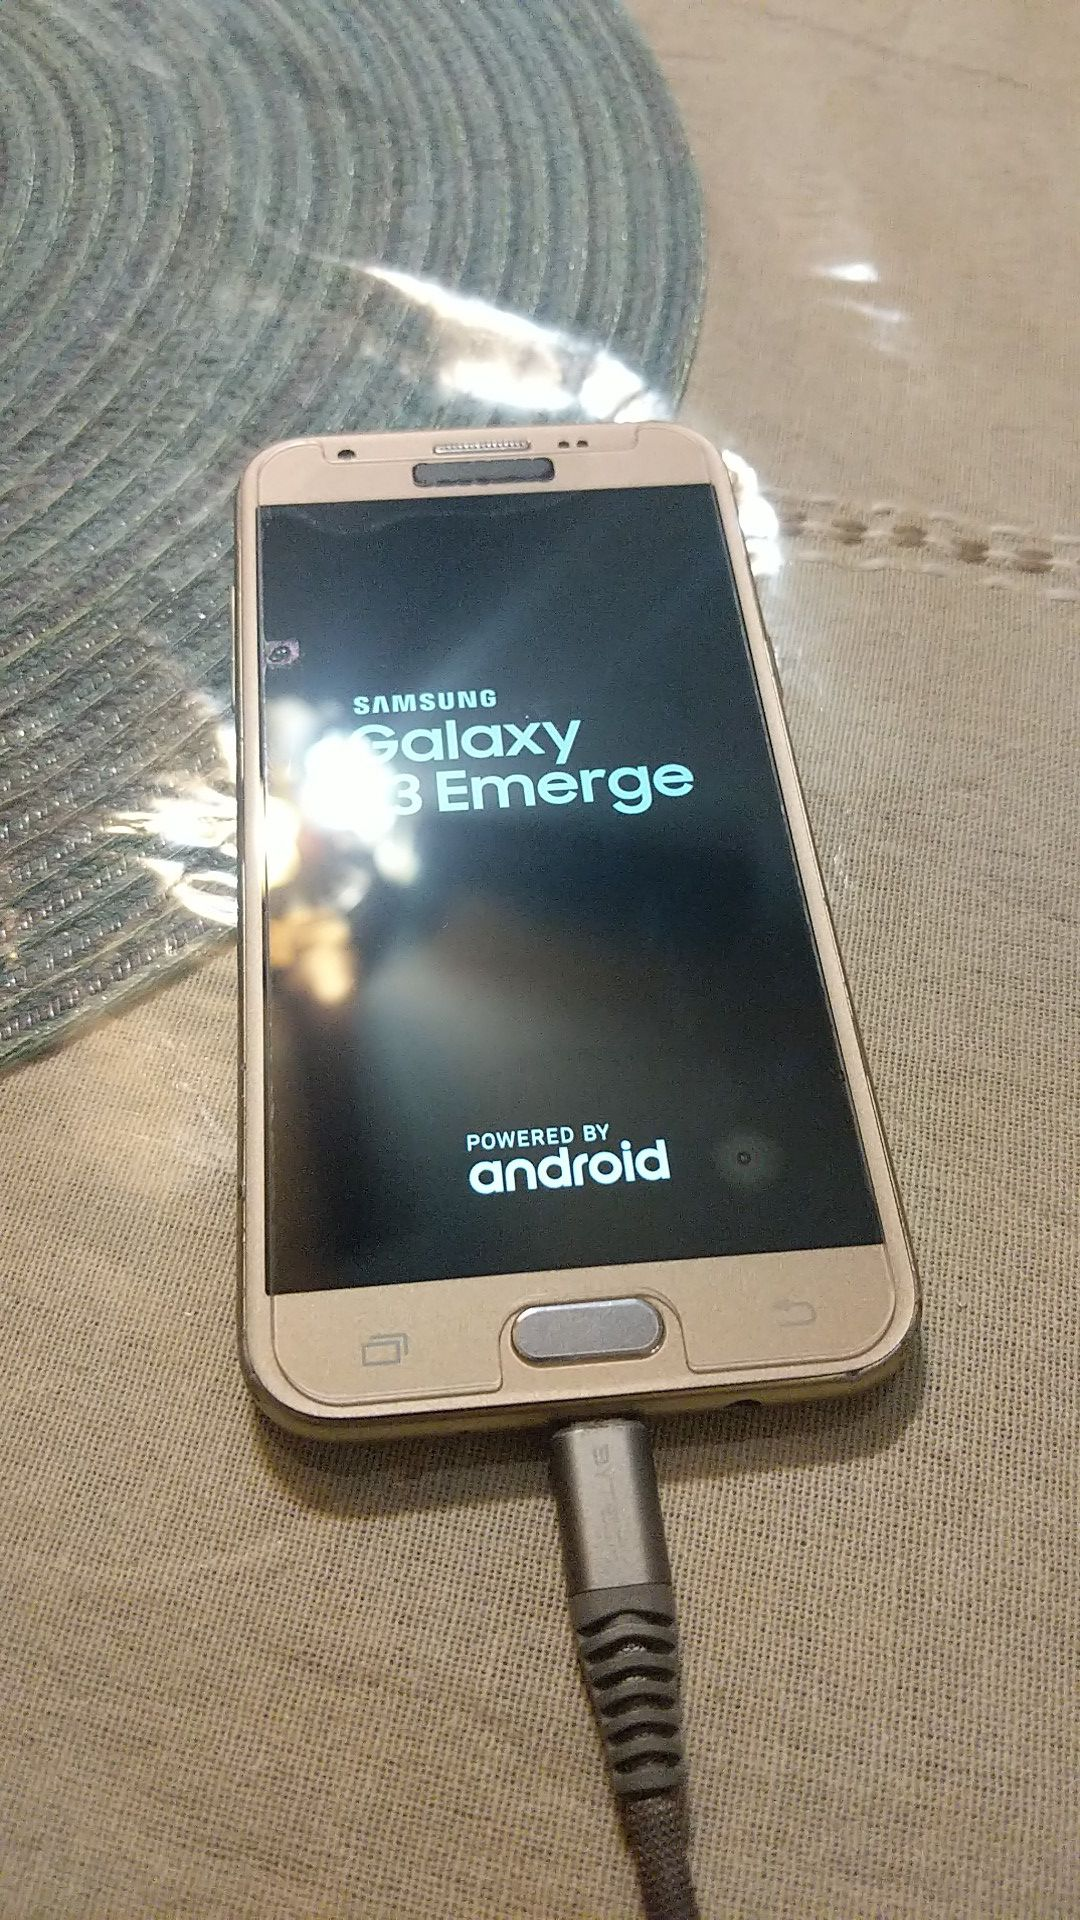 Samsung J3 emerge